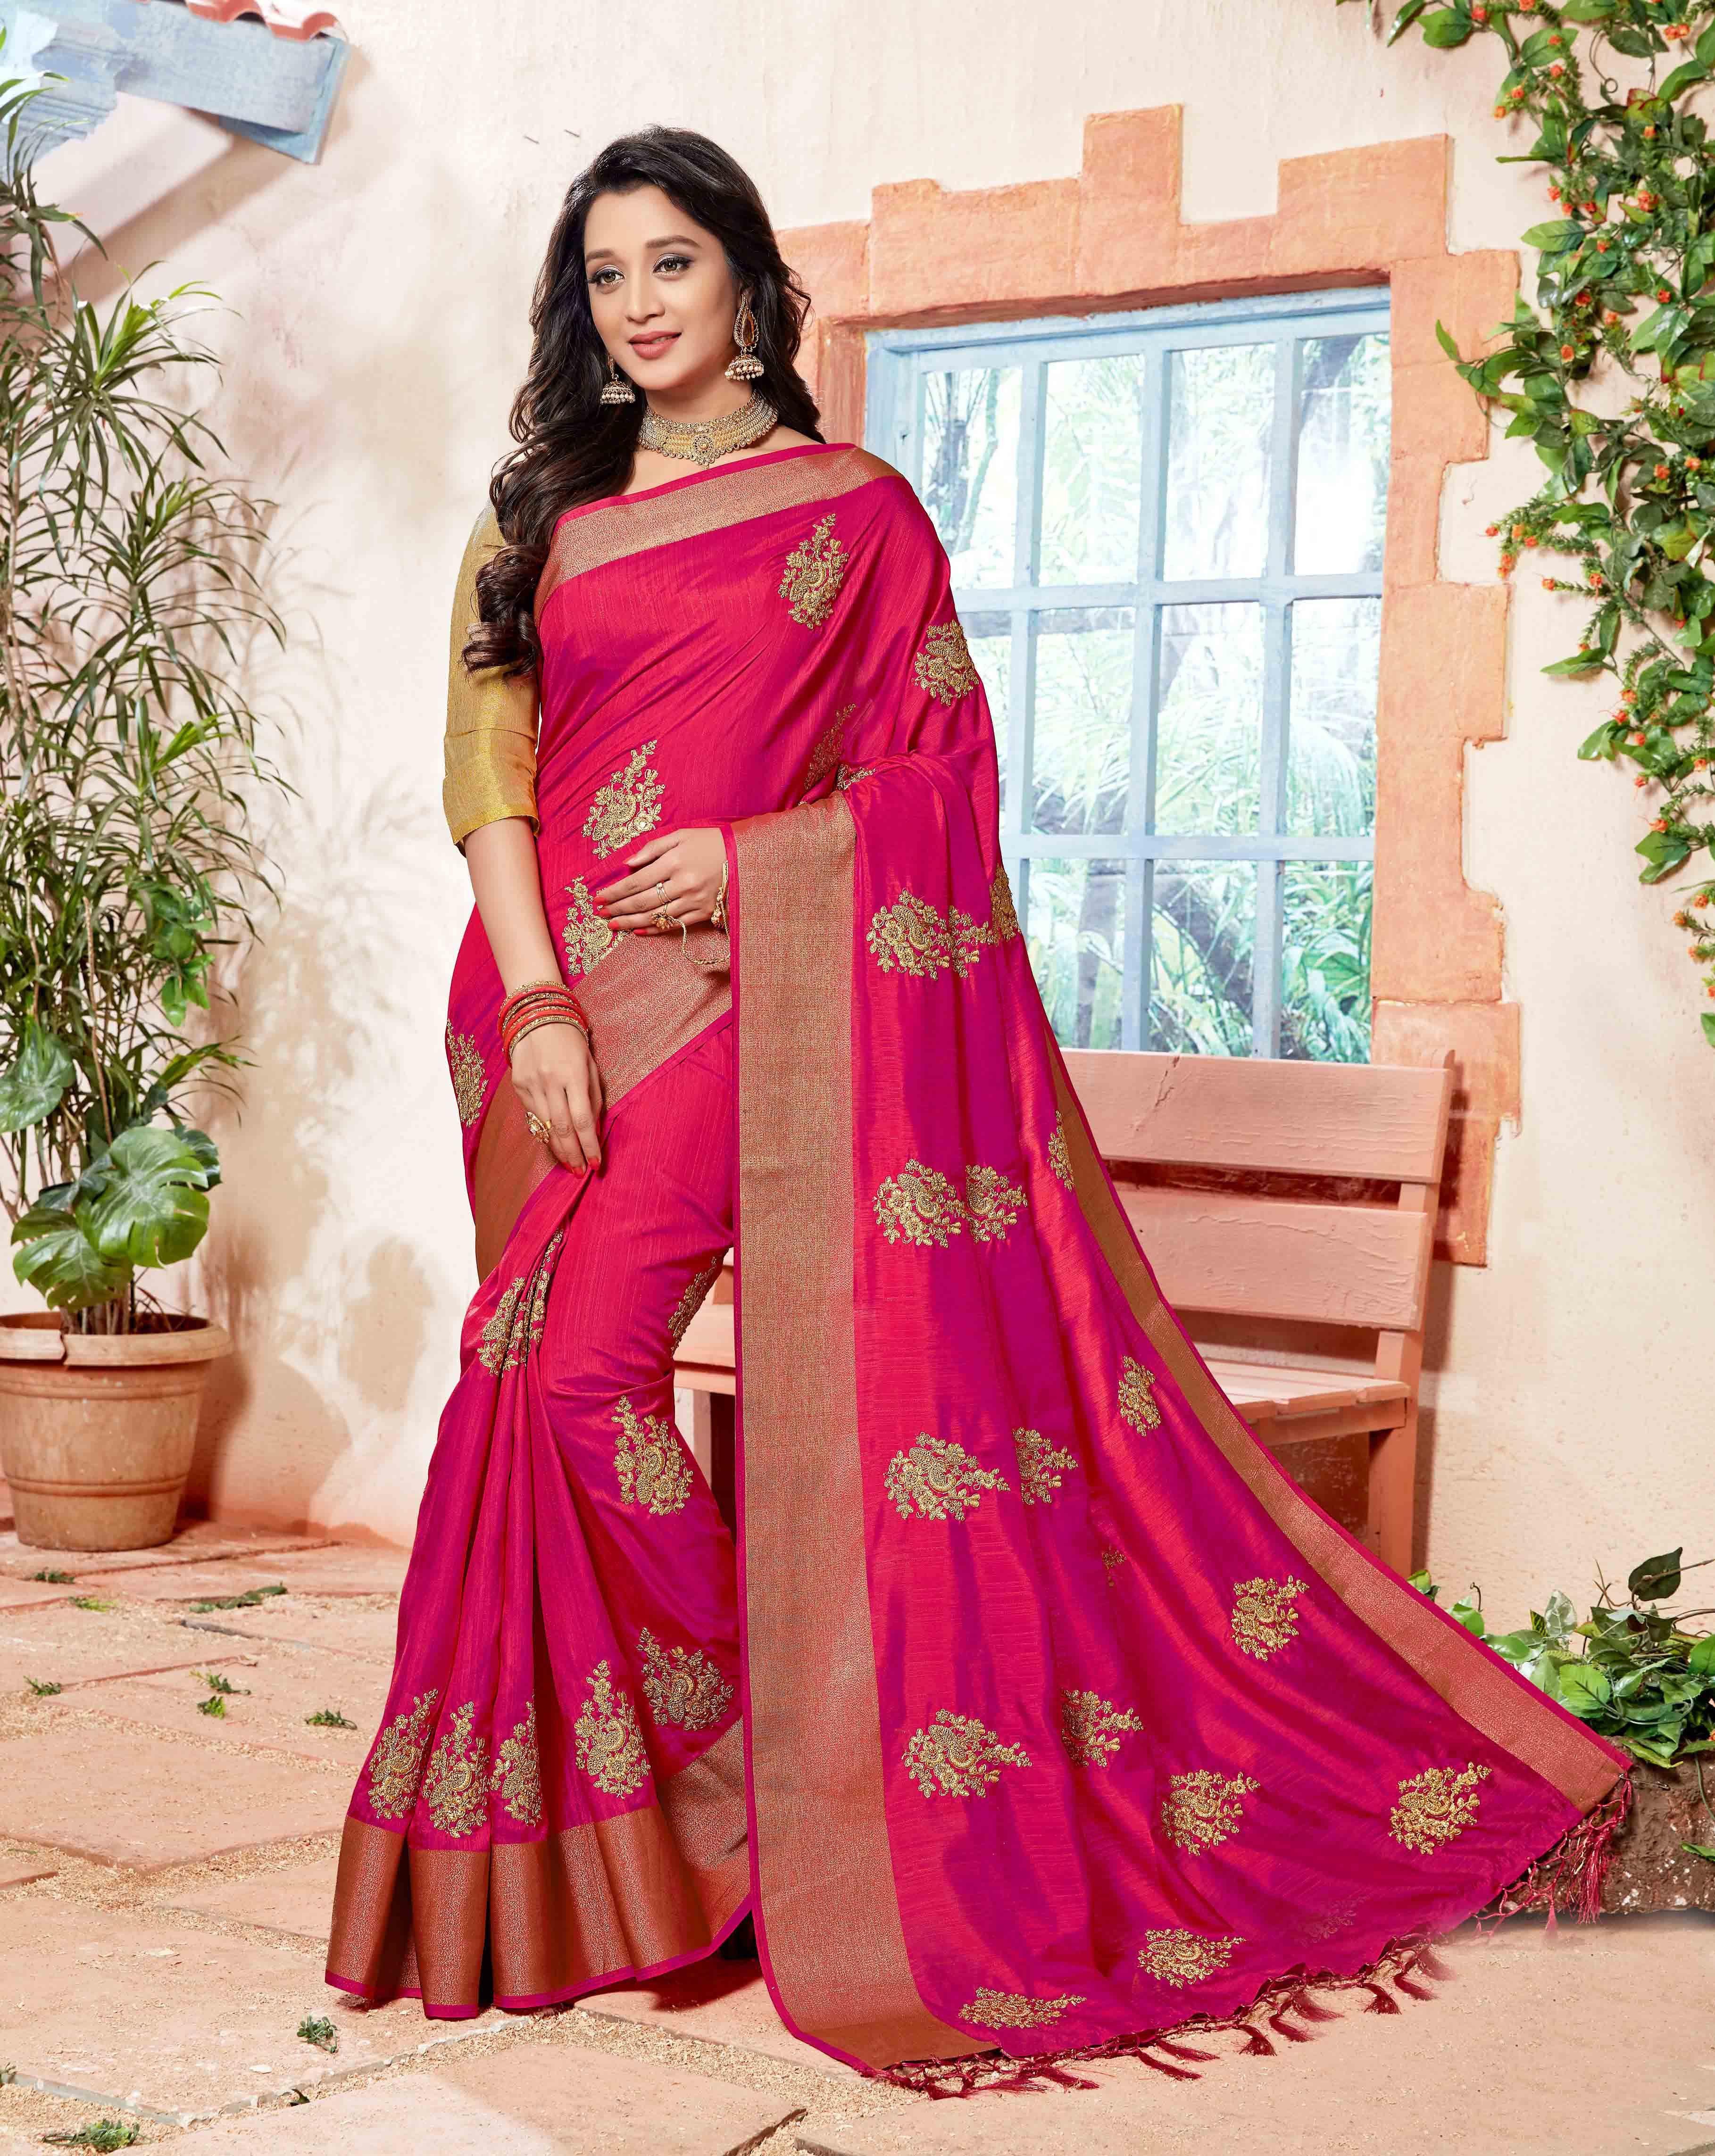 6e7fada617e14a #saree, #Wedding, #Hot, #Blouse, #Pattu, #Draping, #Farewell, #Photoshoot,  #Cotton, #Modern, #Dress, #Georgette, #Styles, #Sabyasachi, #Floral, #Lace,  ...